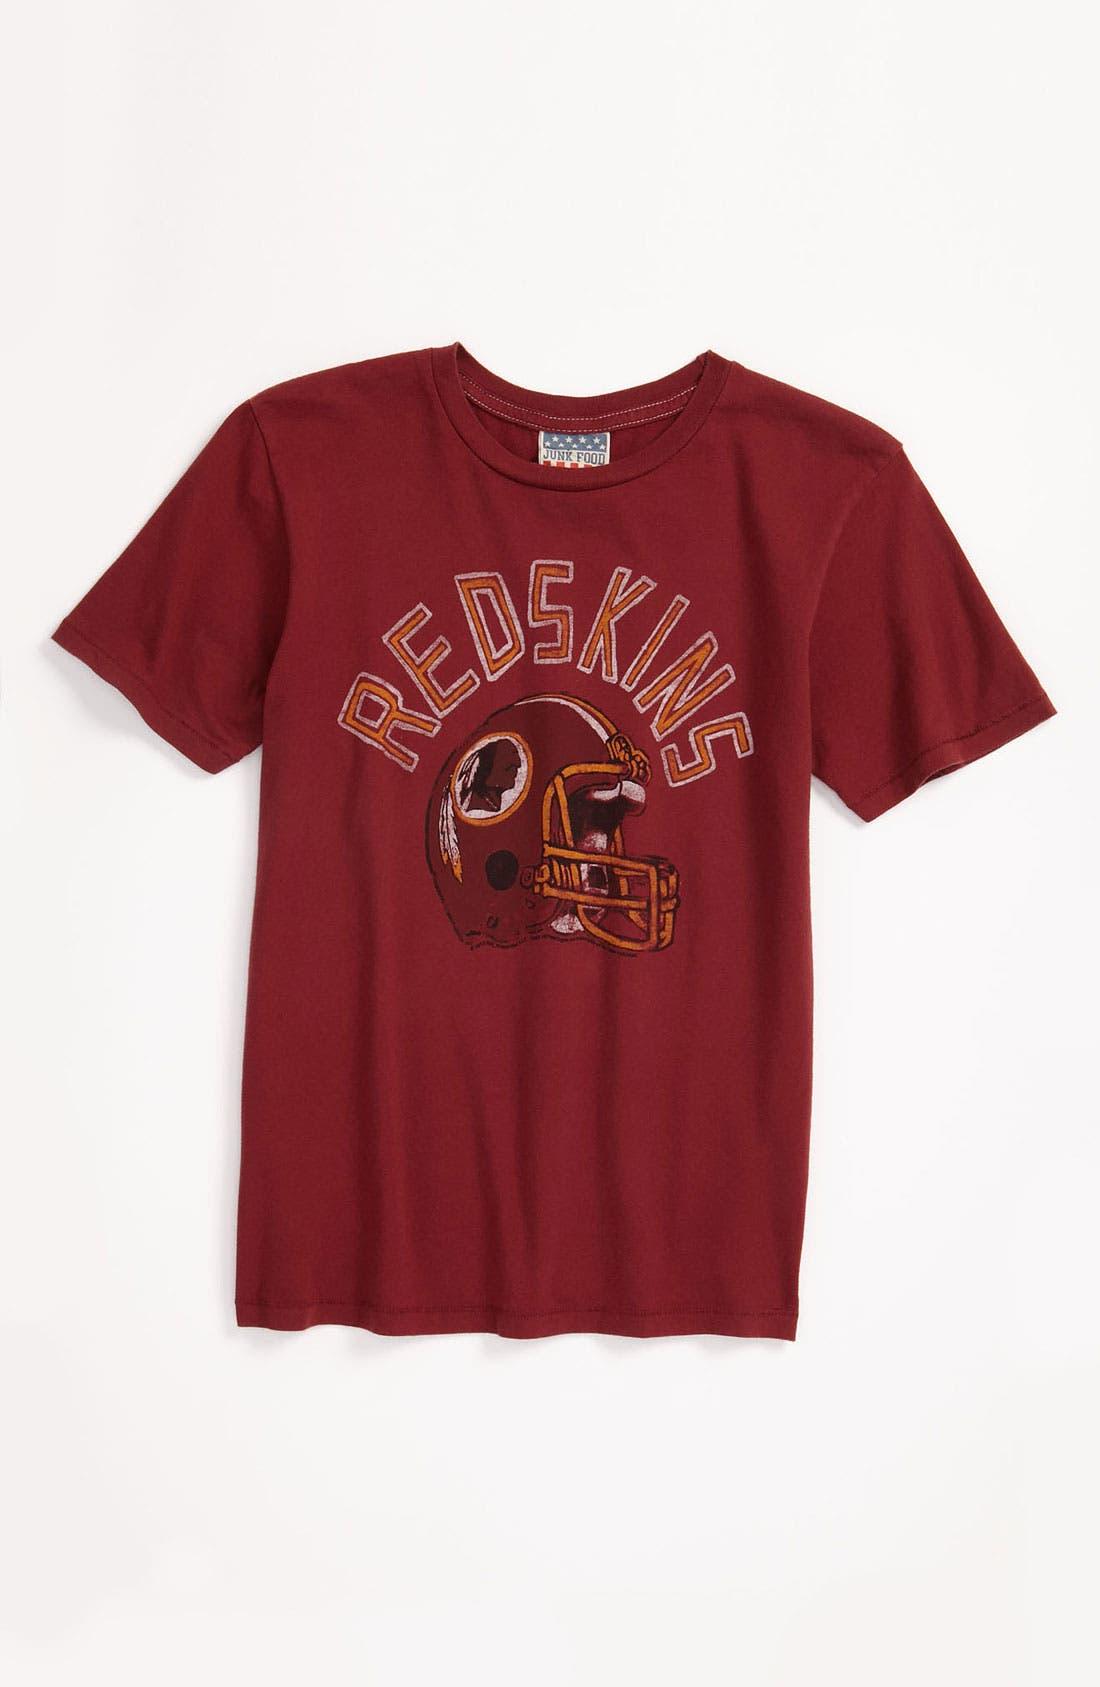 Alternate Image 1 Selected - Junk Food 'Washington Redskins' T-Shirt (Little Boys & Big Boys)